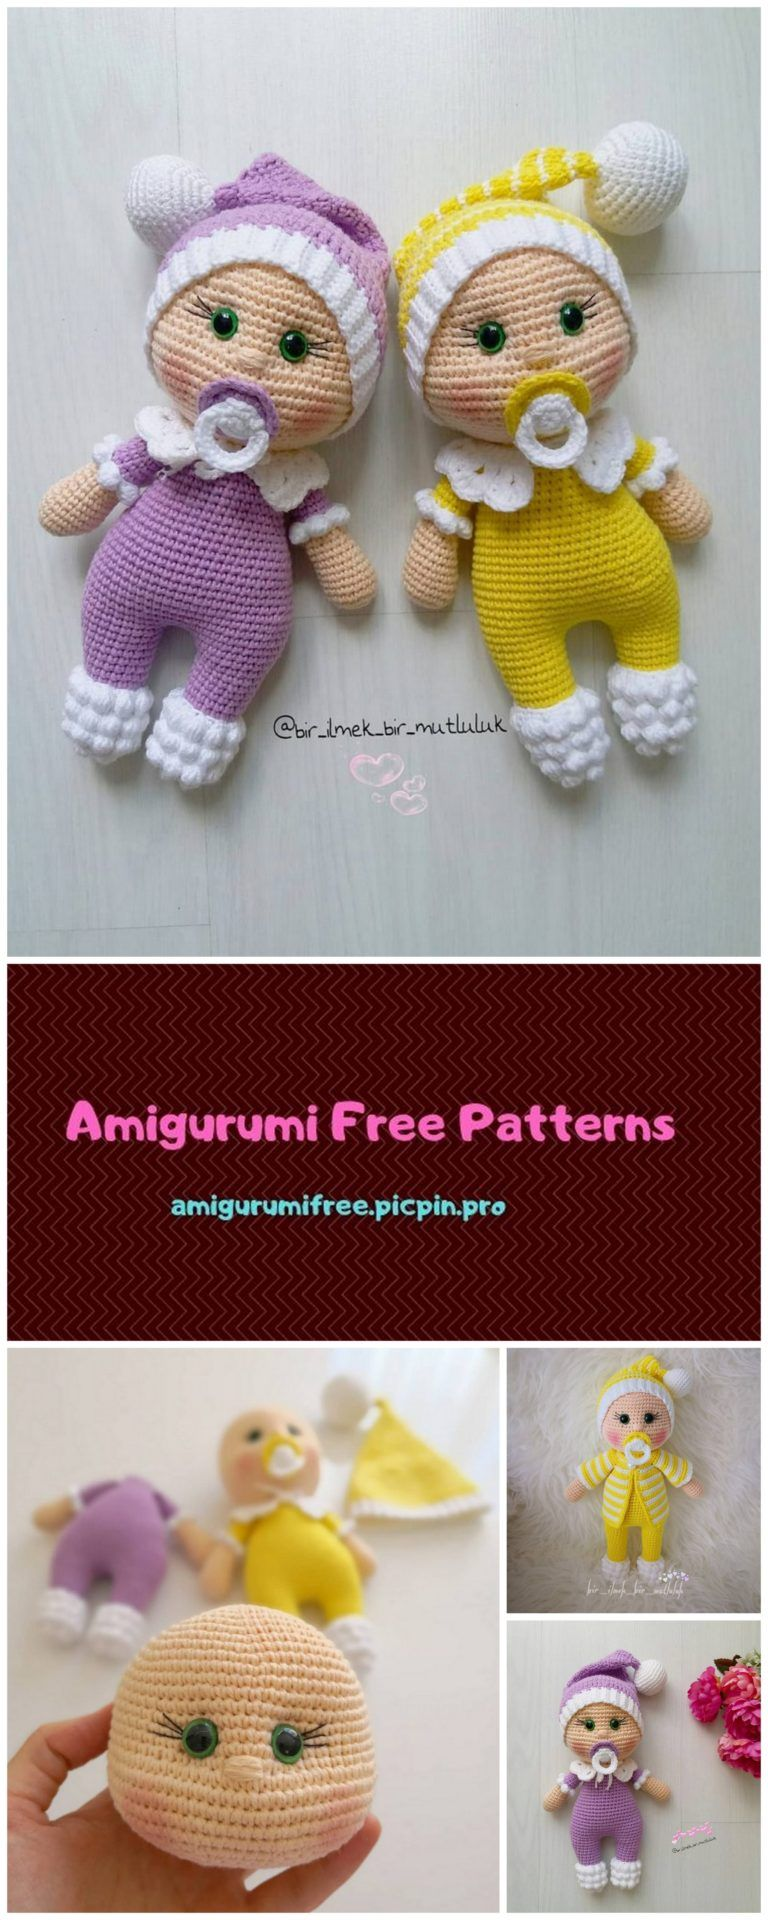 Samyelinin Örgüleri: Amigurumi Doll Pacifier Baby (Free English Pattern) | 1920x768